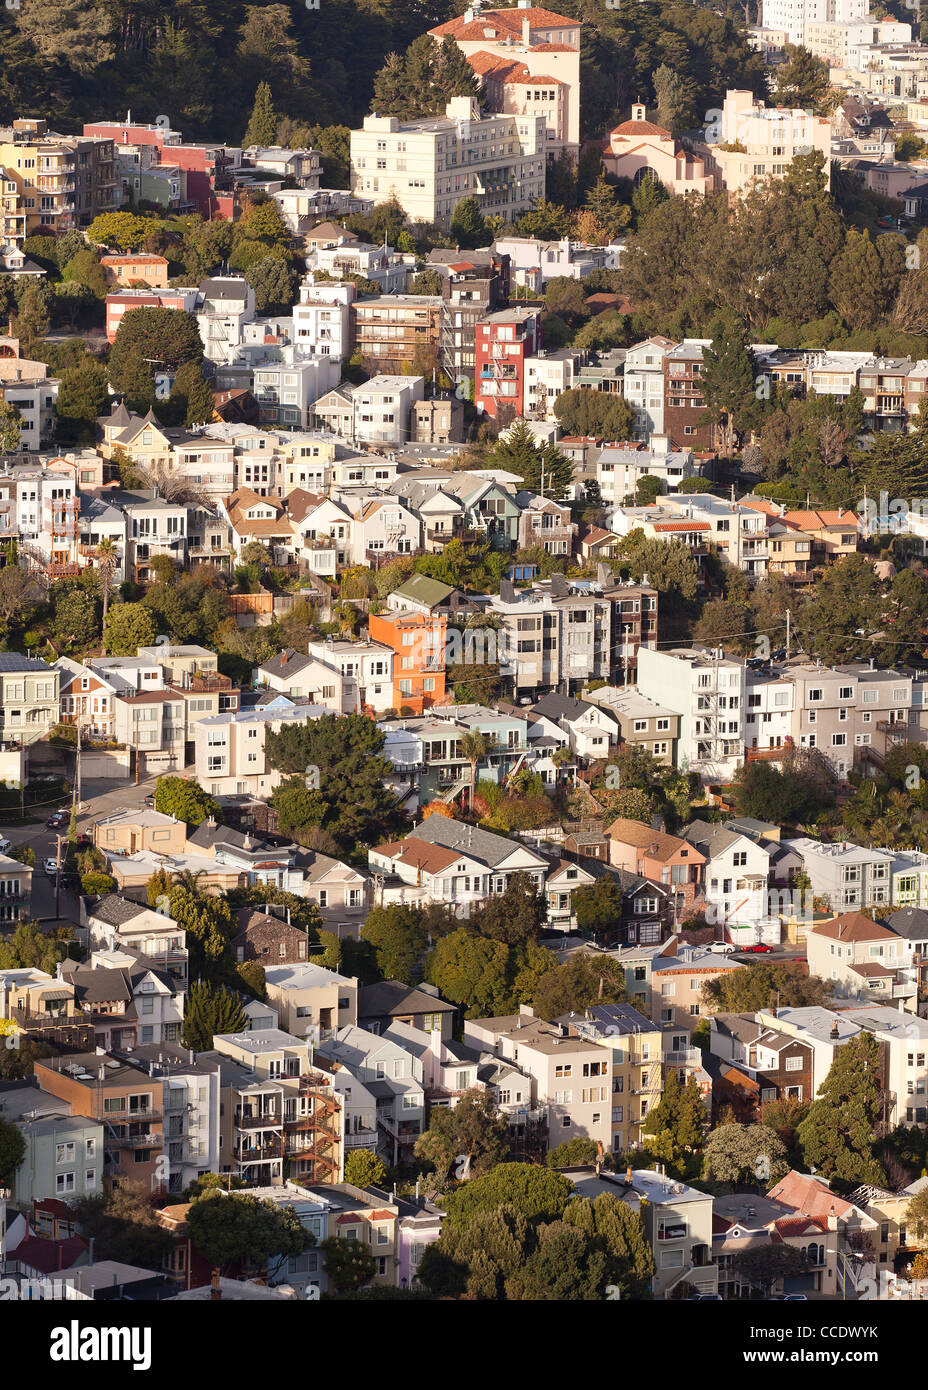 San Francisco homes on hillside - Stock Image